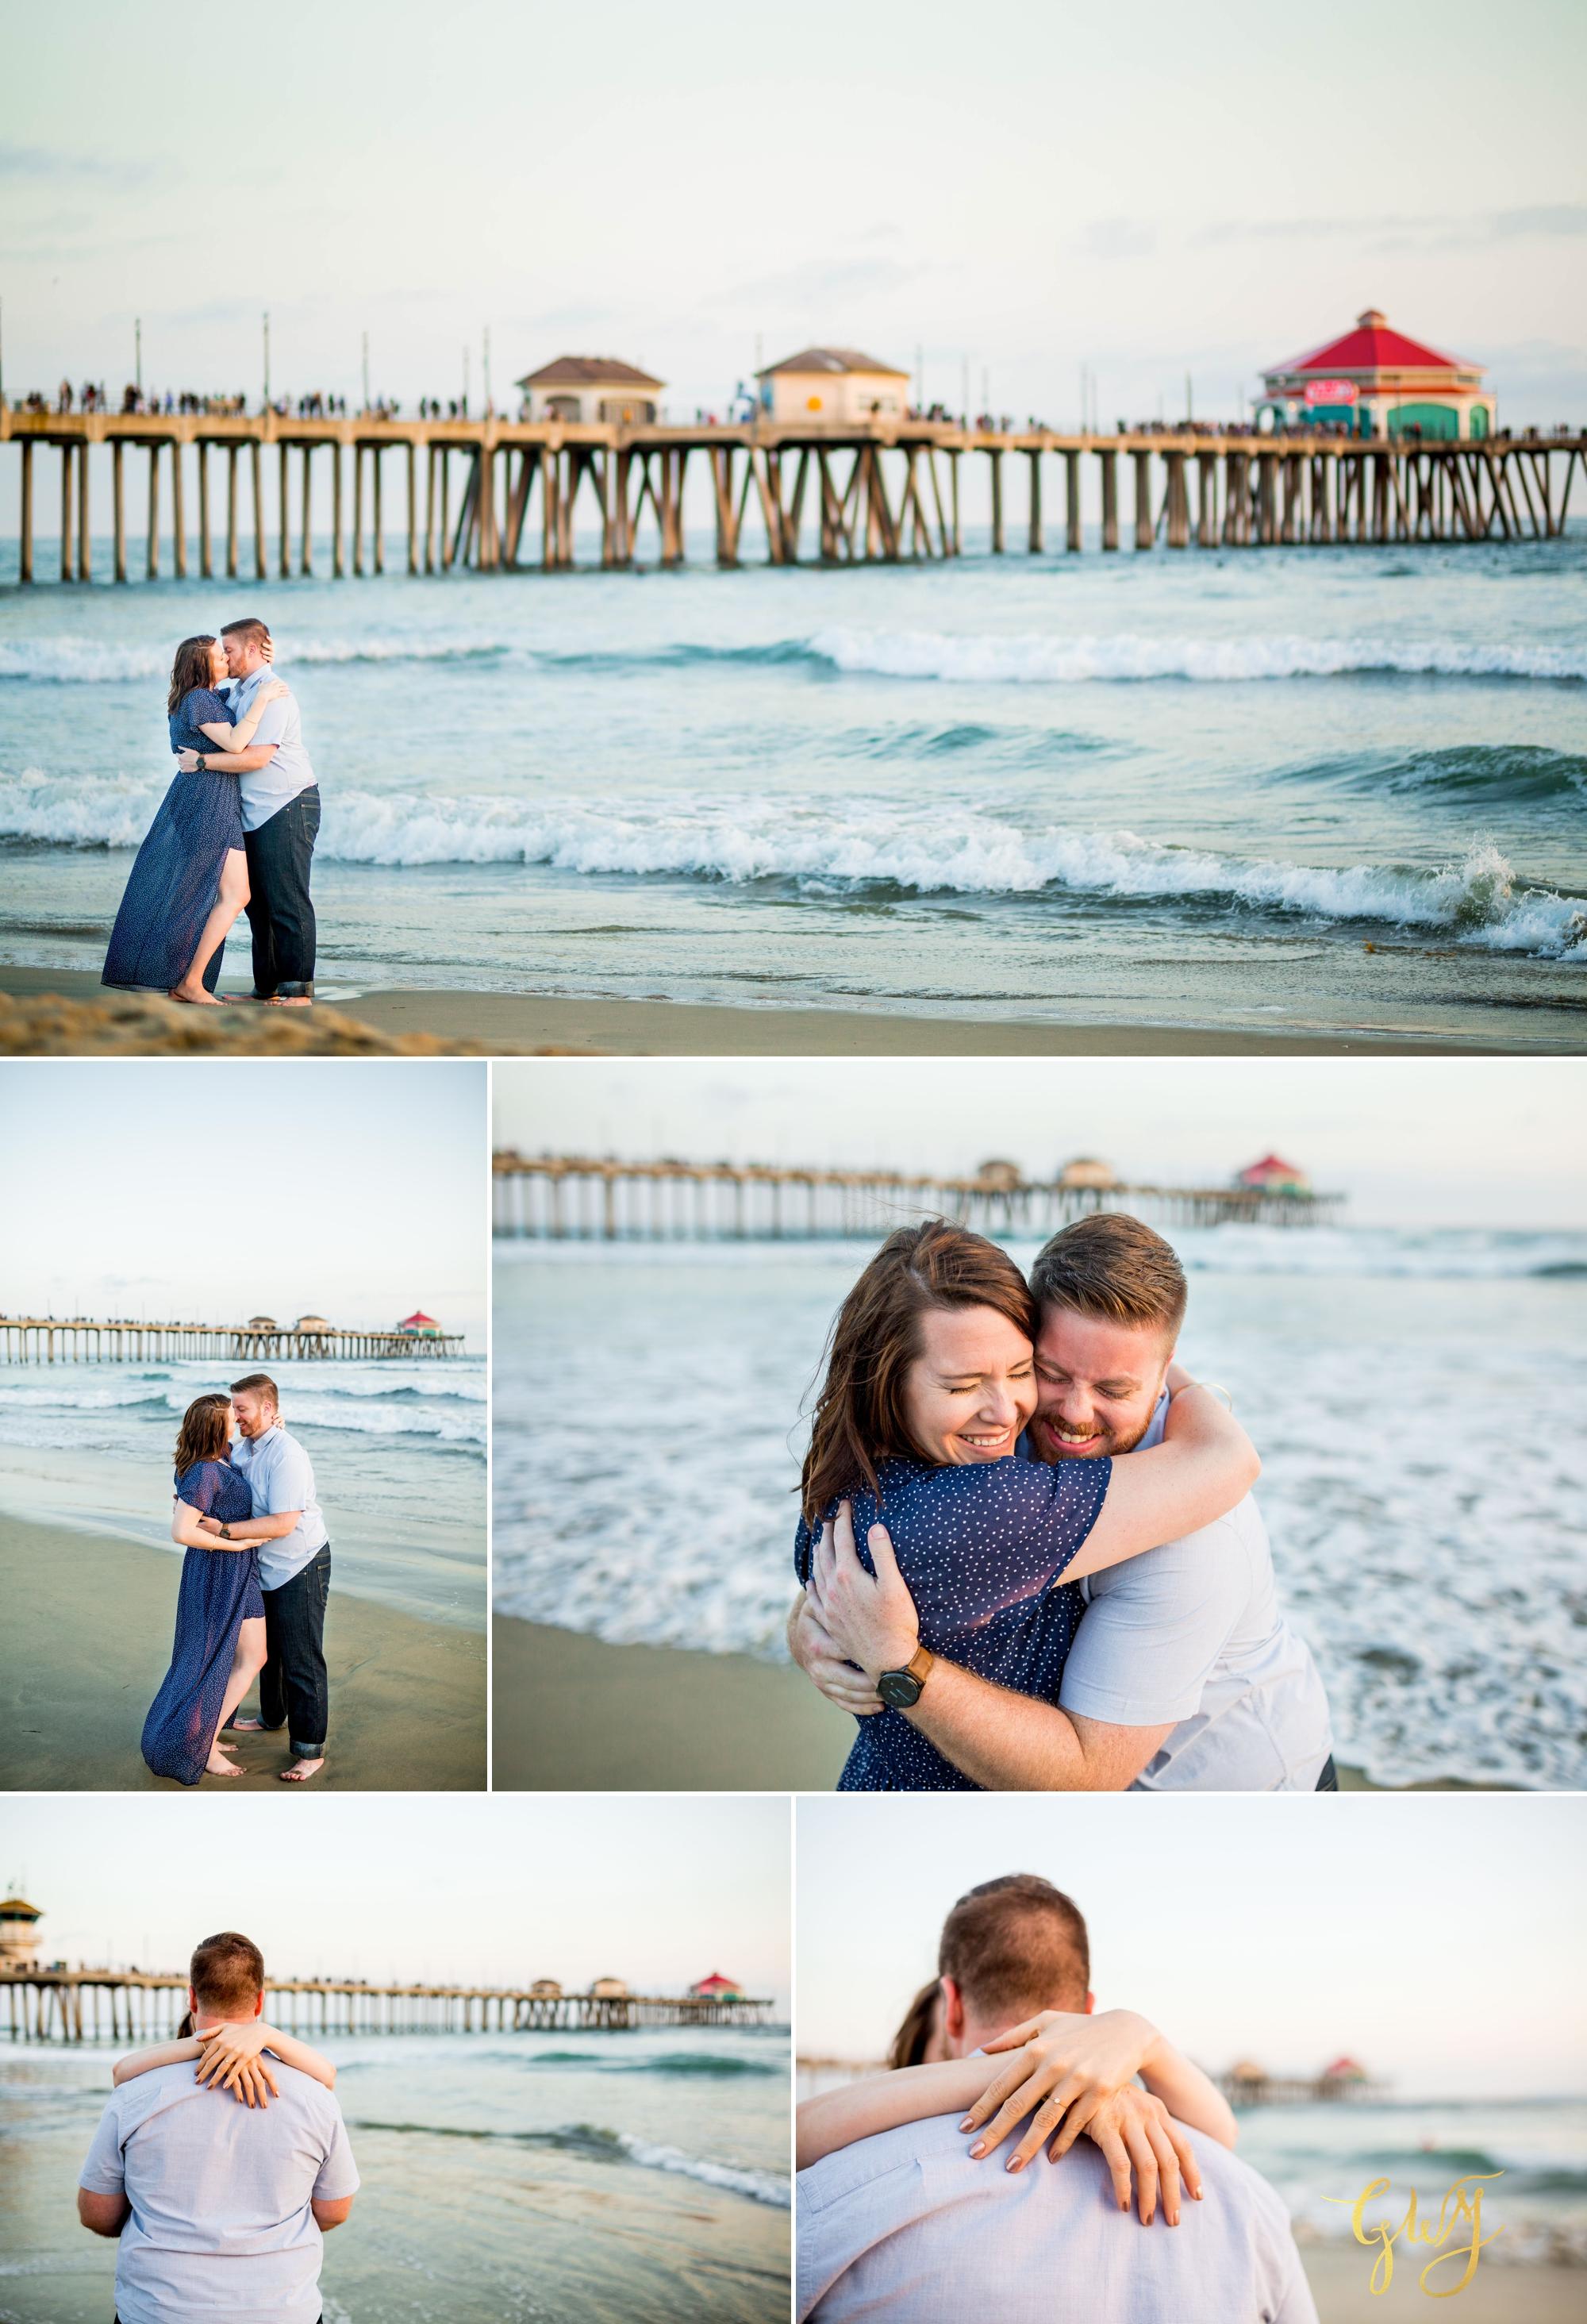 Cristina + David's Huntington Beach Central Park Romantic Sunset Engagement Session by Glass Woods Media 15.jpg